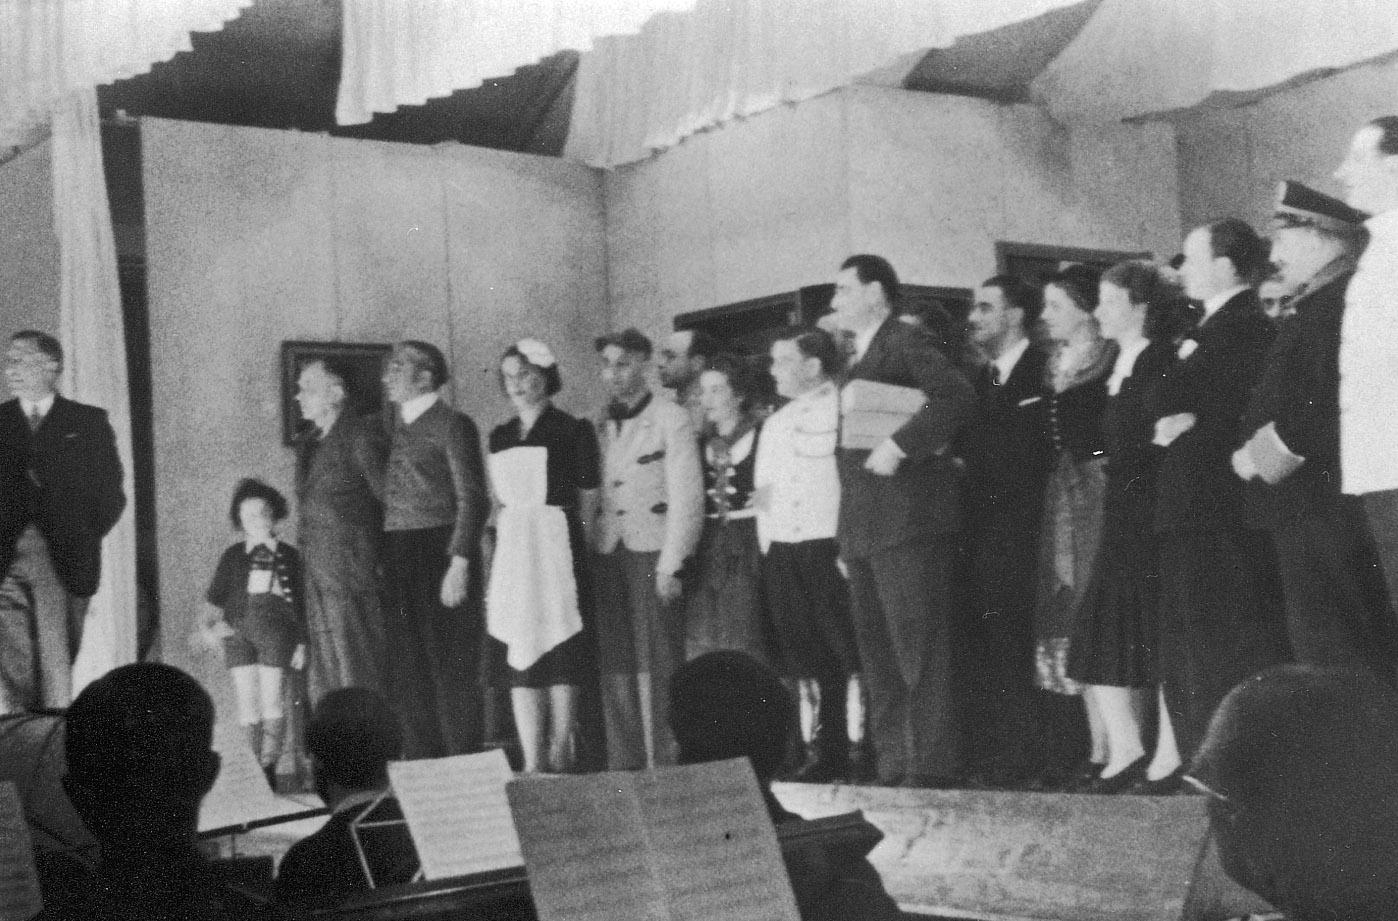 Cabaret in kamp Westerbork.